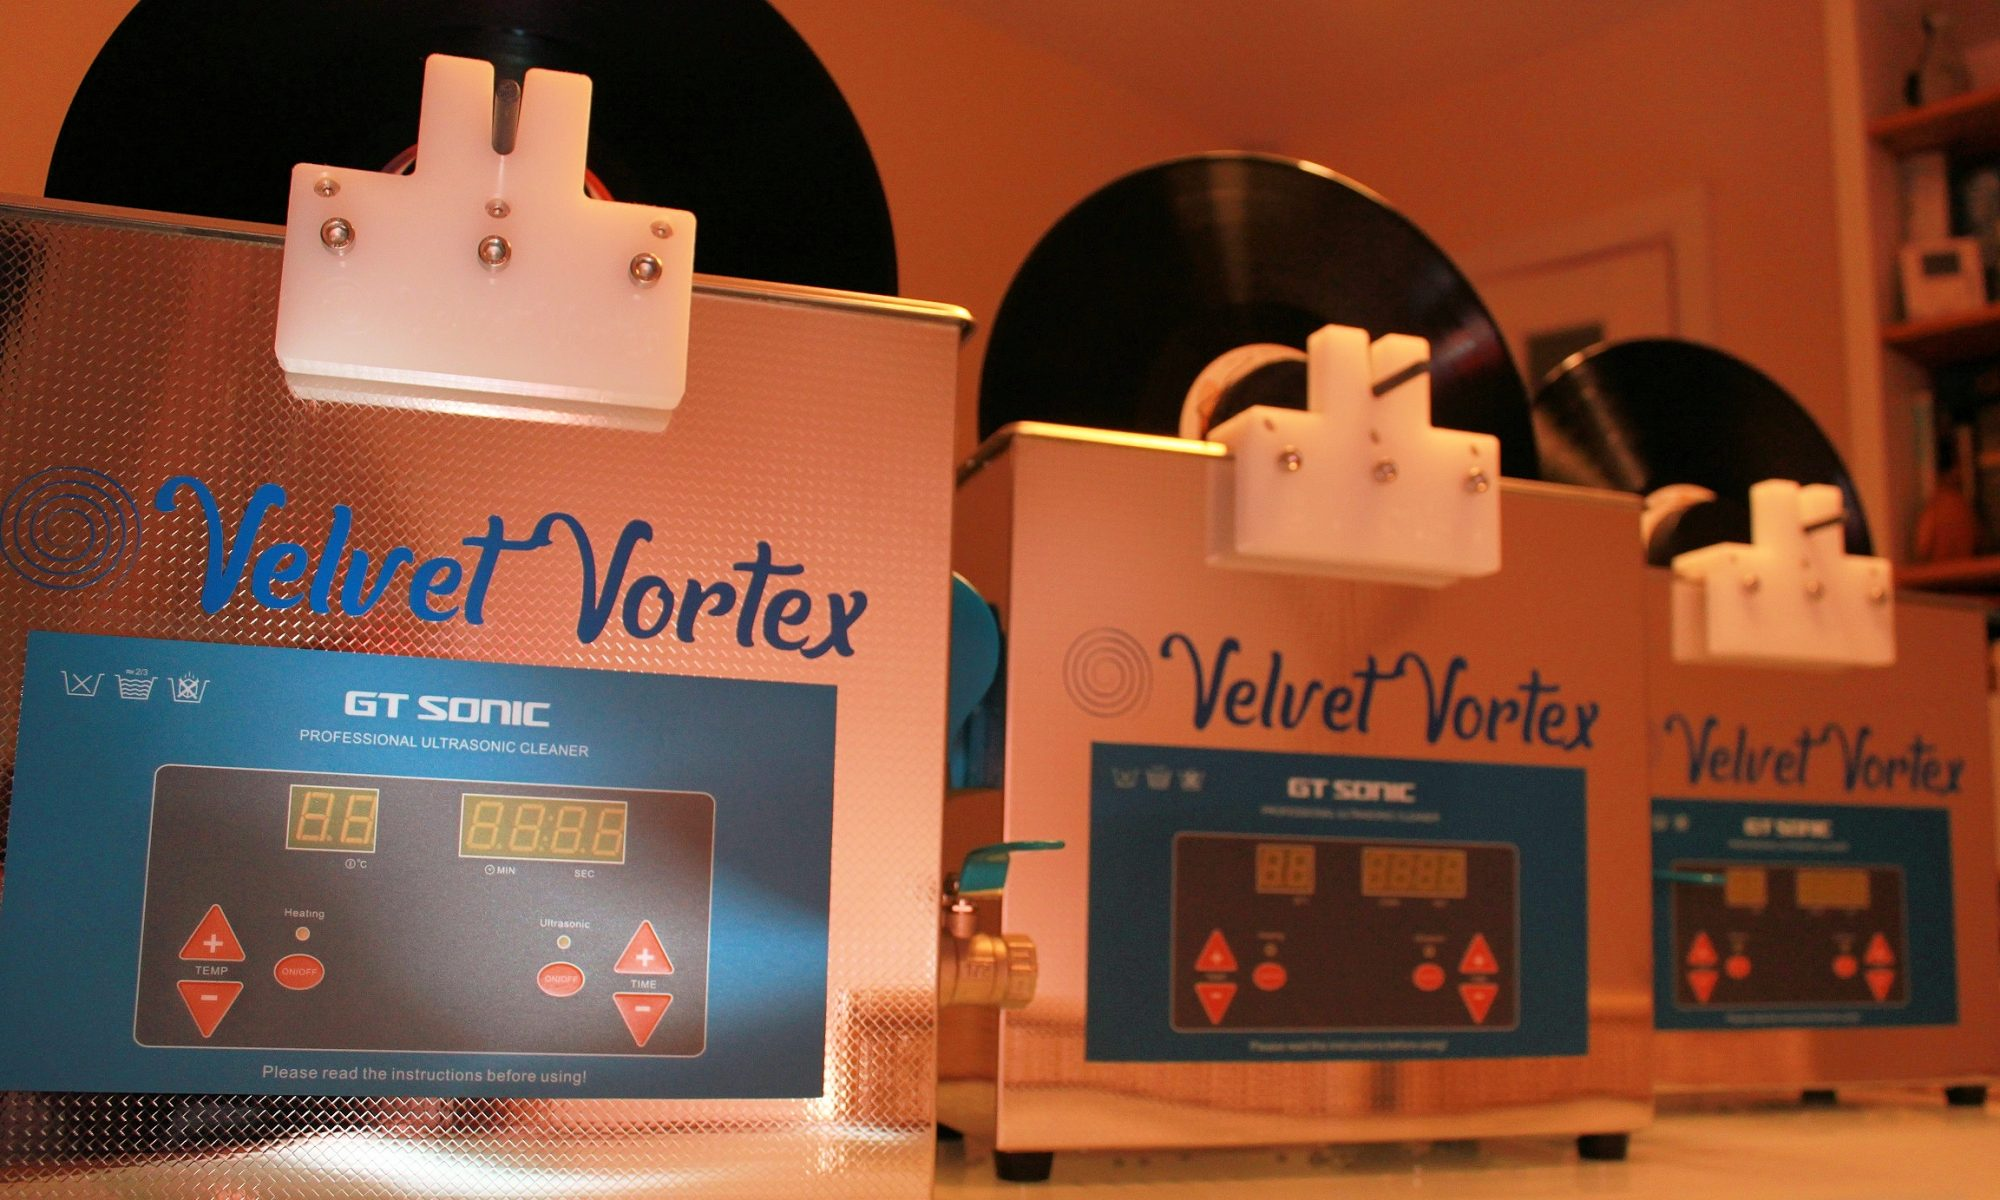 Velvet Vortex